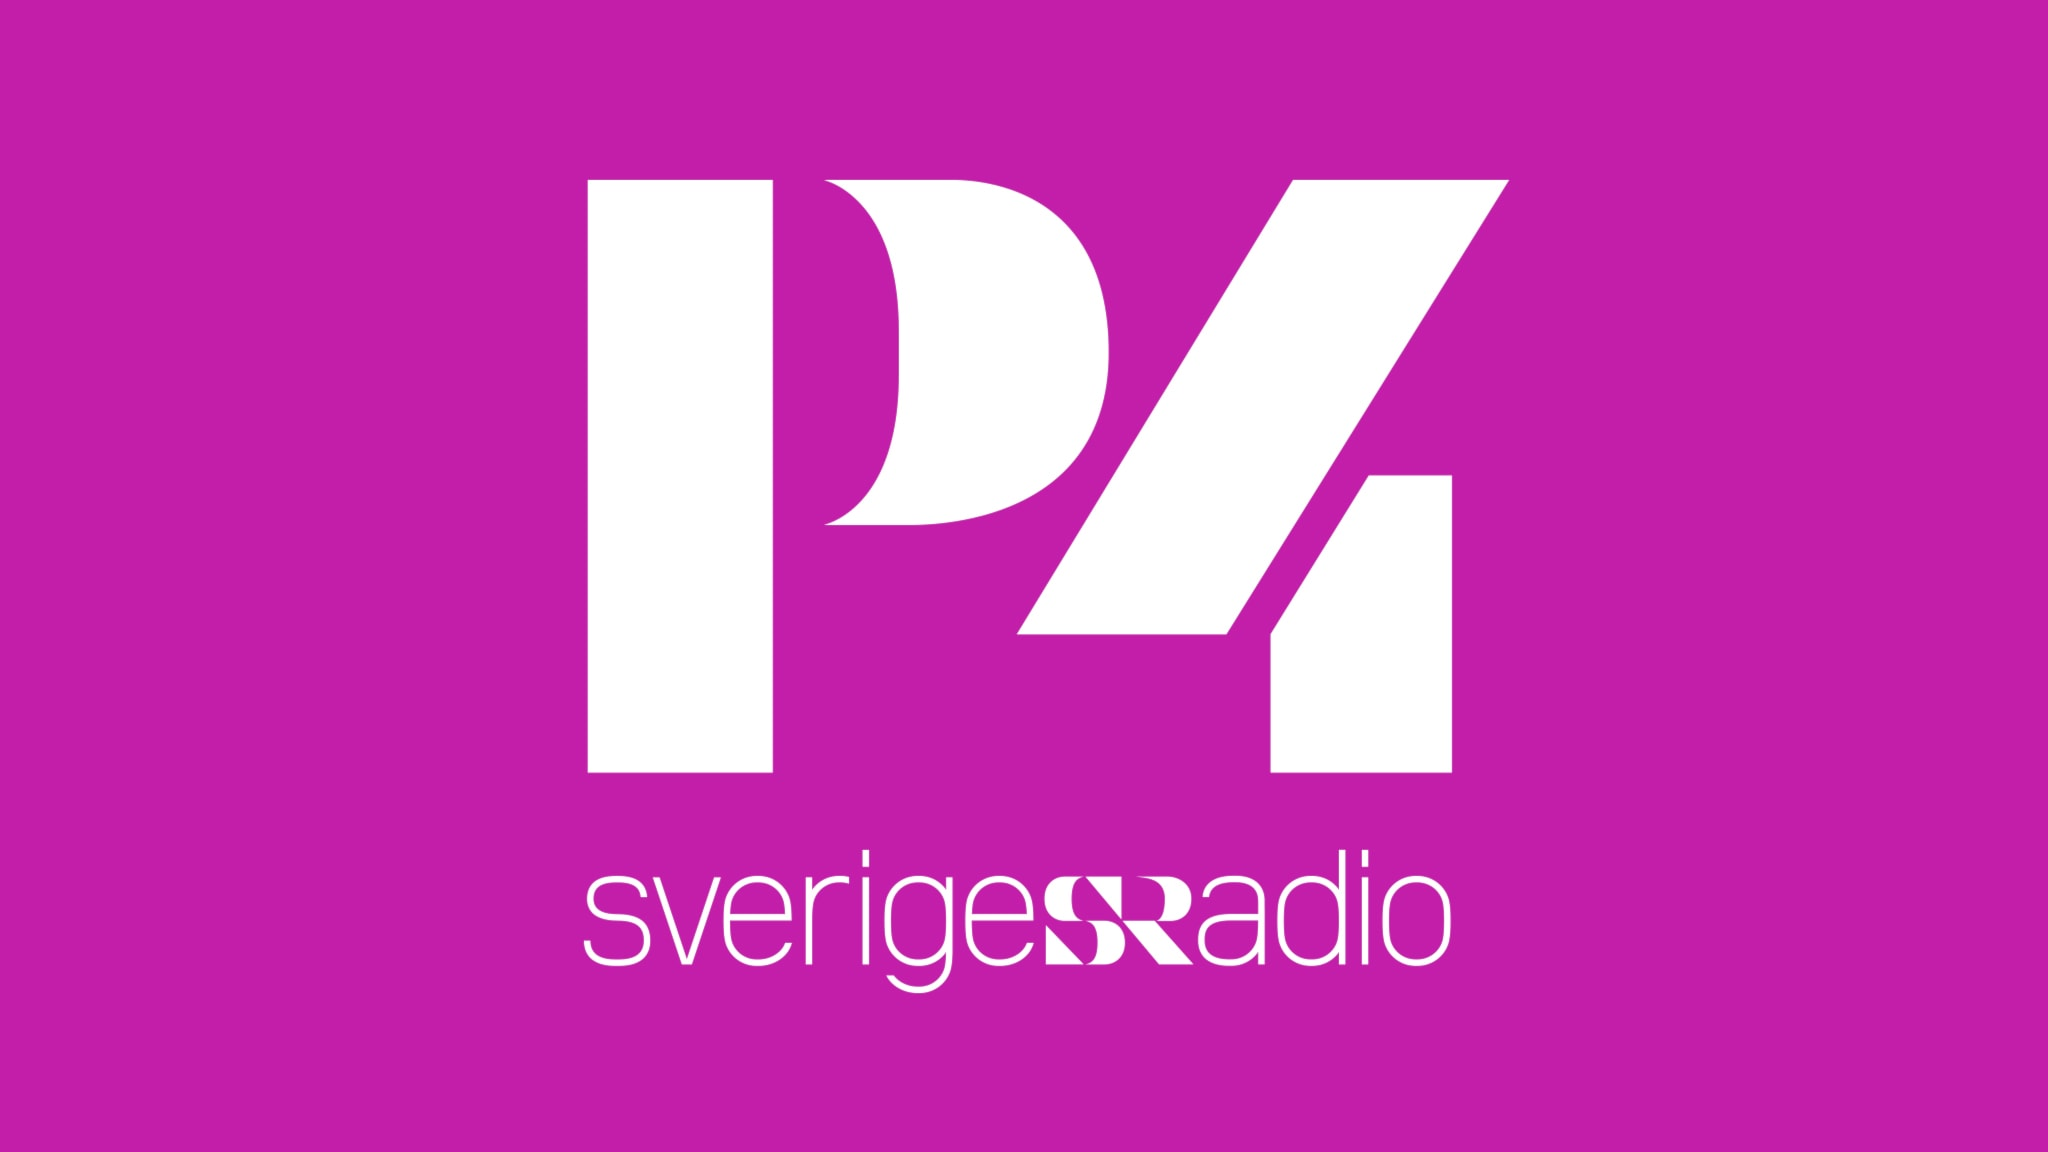 Trafik P4 Göteborg 20180726 07.22 (00.32) - spela